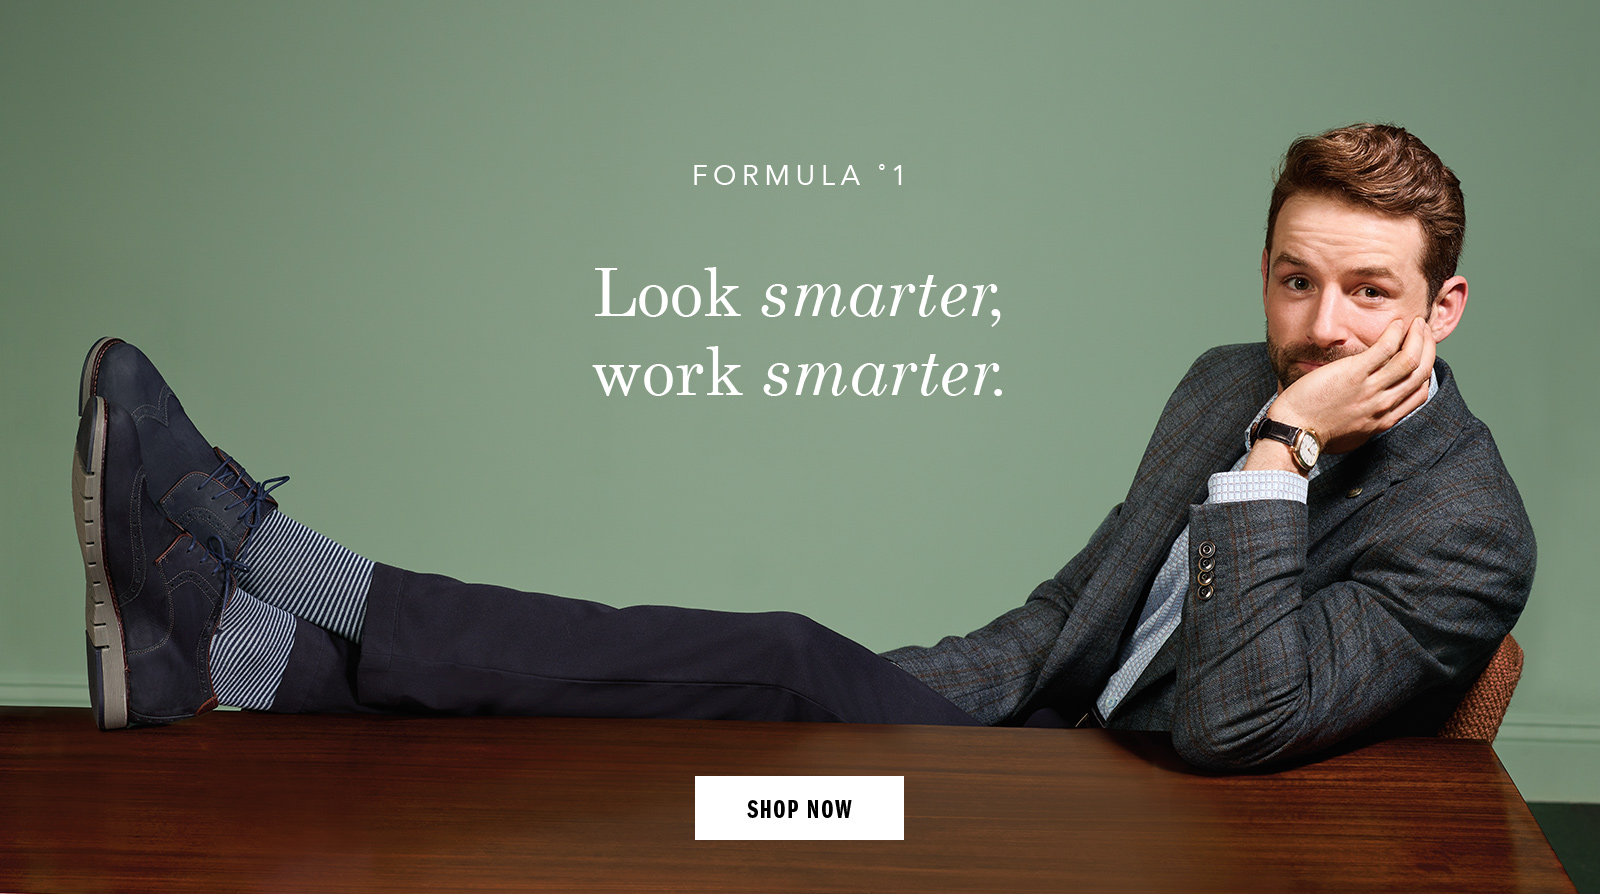 Look smarter work smarter - Shop Men Shoes and Apparel